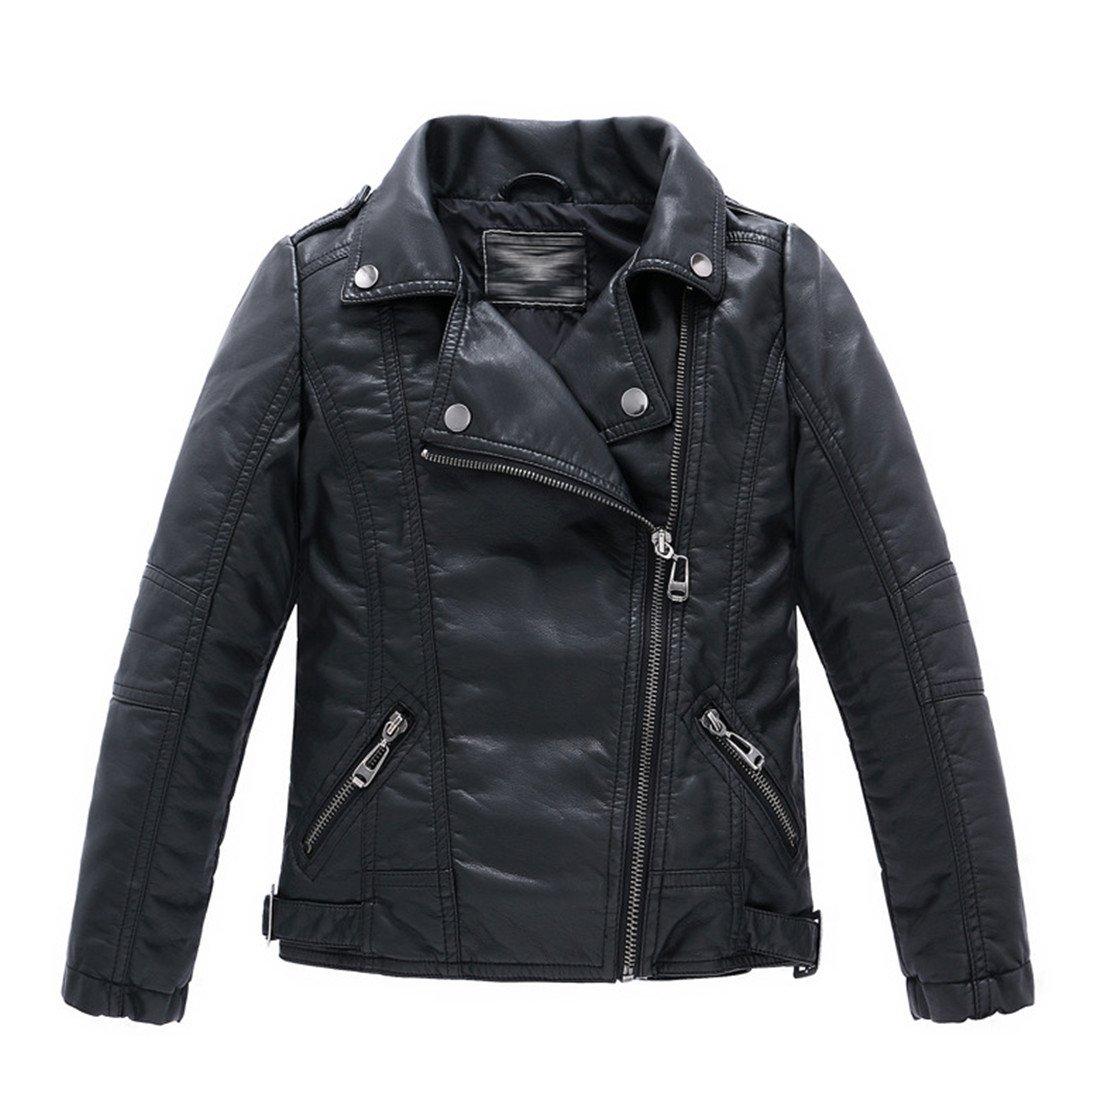 LJYH Girls New Stand Collar Slim Fit PU Leather Jacket Kids Zipper Coat